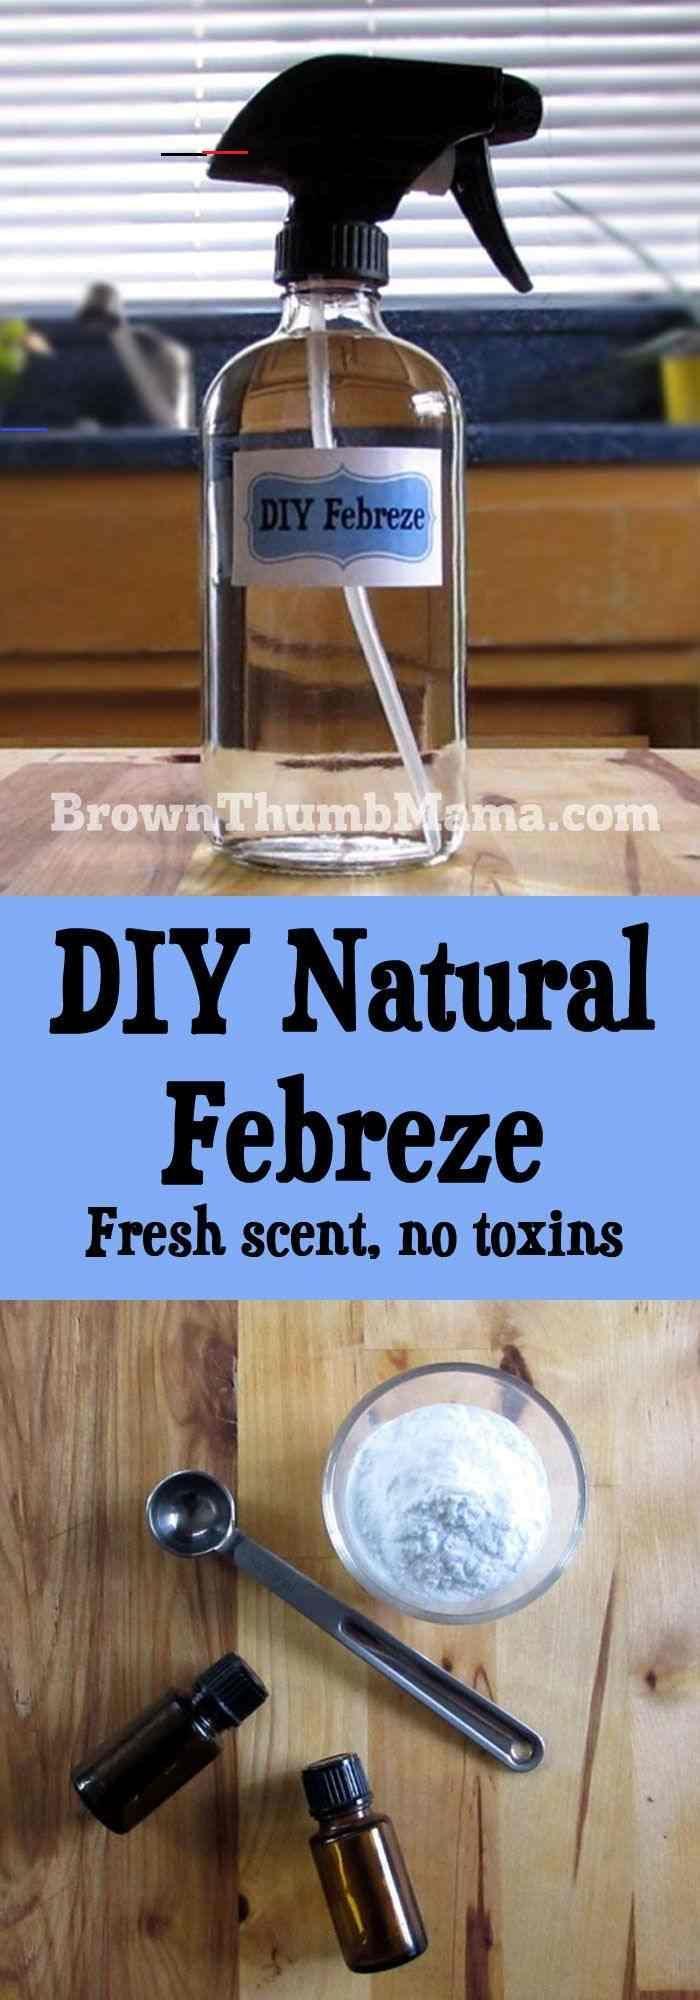 Homemade Natural Febreze Febreze Homemade Makeupbrushes Makeupforbeginner In 2020 Natural Air Freshener Natural Air Freshener Spray Diy Cleaning Products Recipes